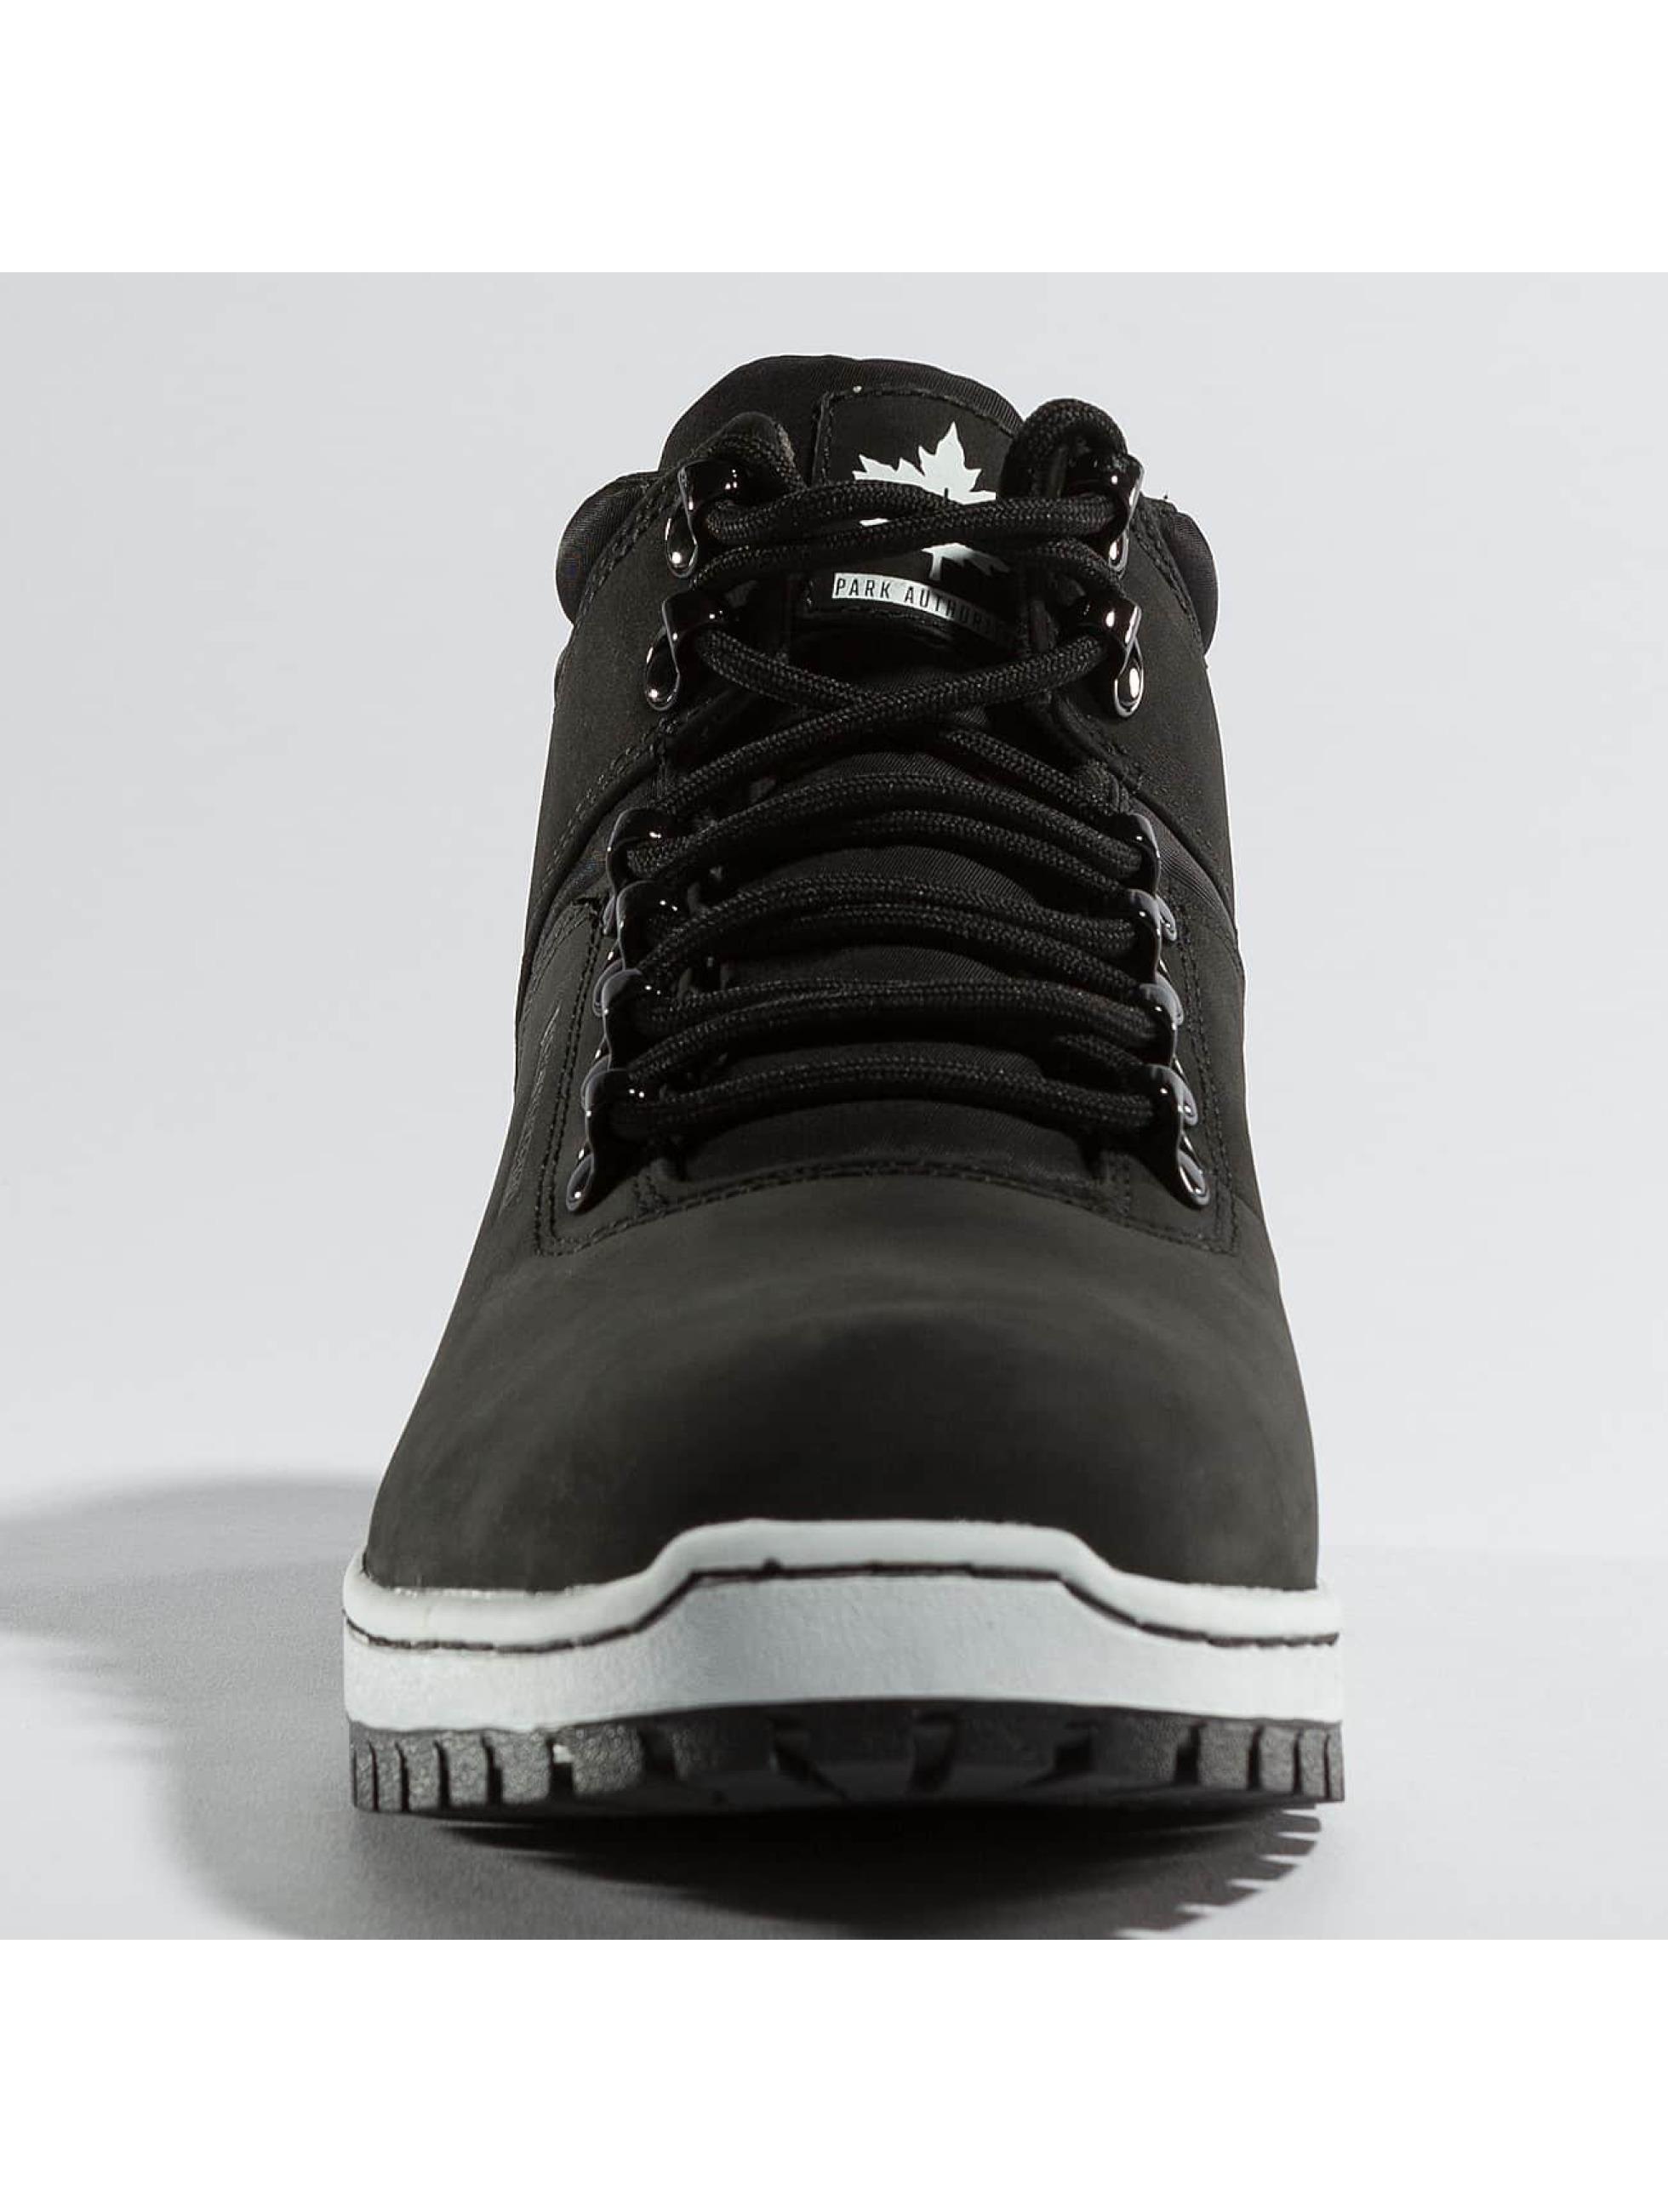 K1X Chaussures montantes H1ke Territory noir